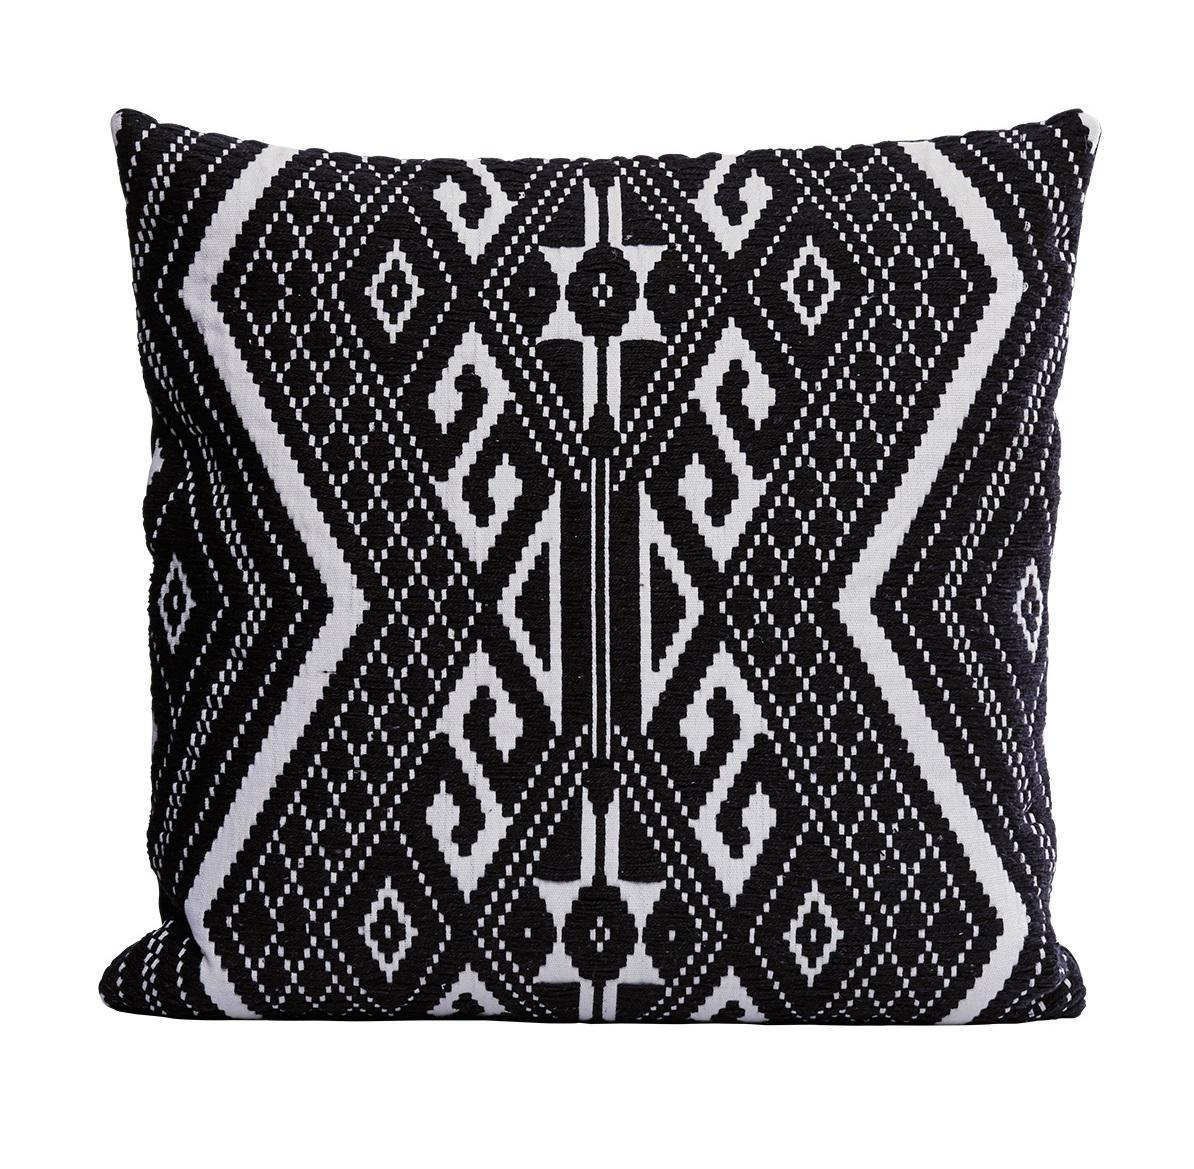 House Doctor Povlak na polštář Andy 50x50 cm, černá barva, textil